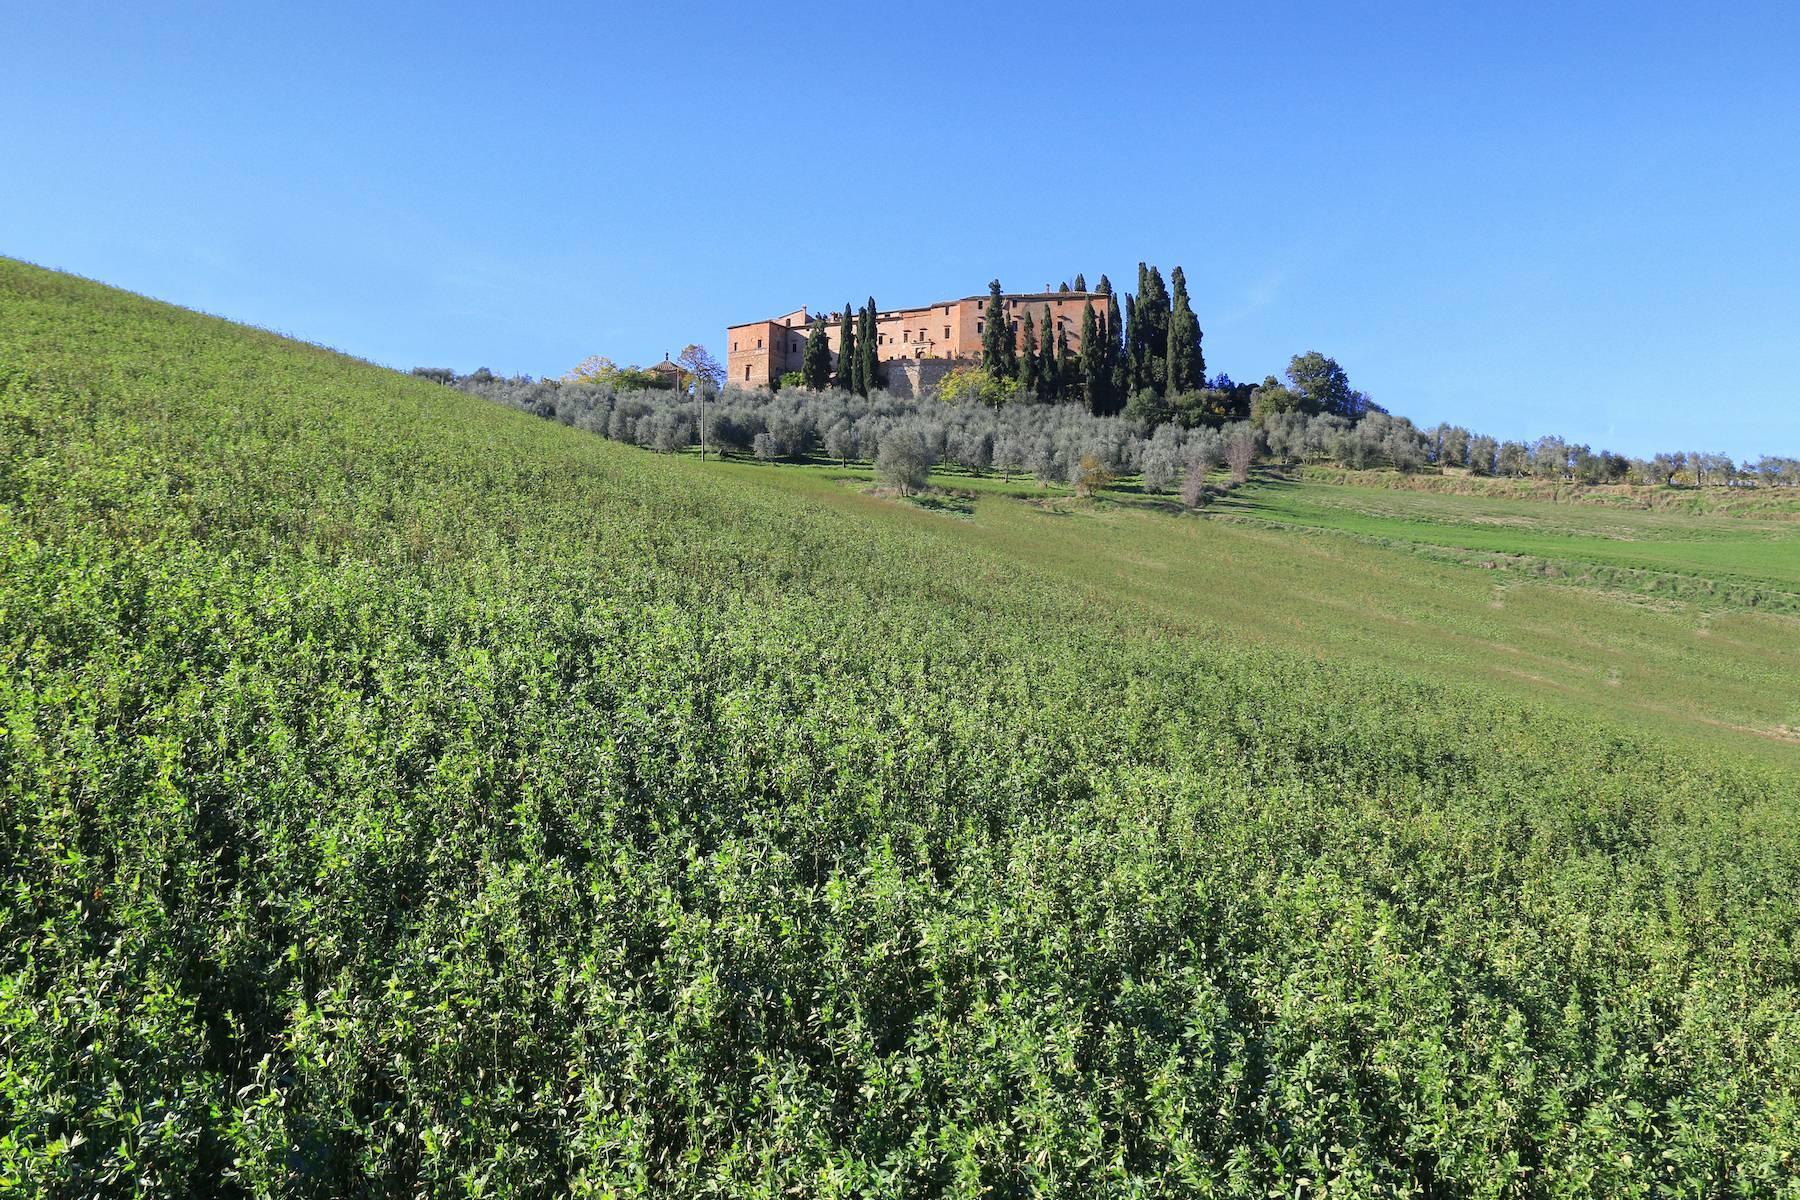 Wunderschönes Schloss im Herzen der Toskana - 3